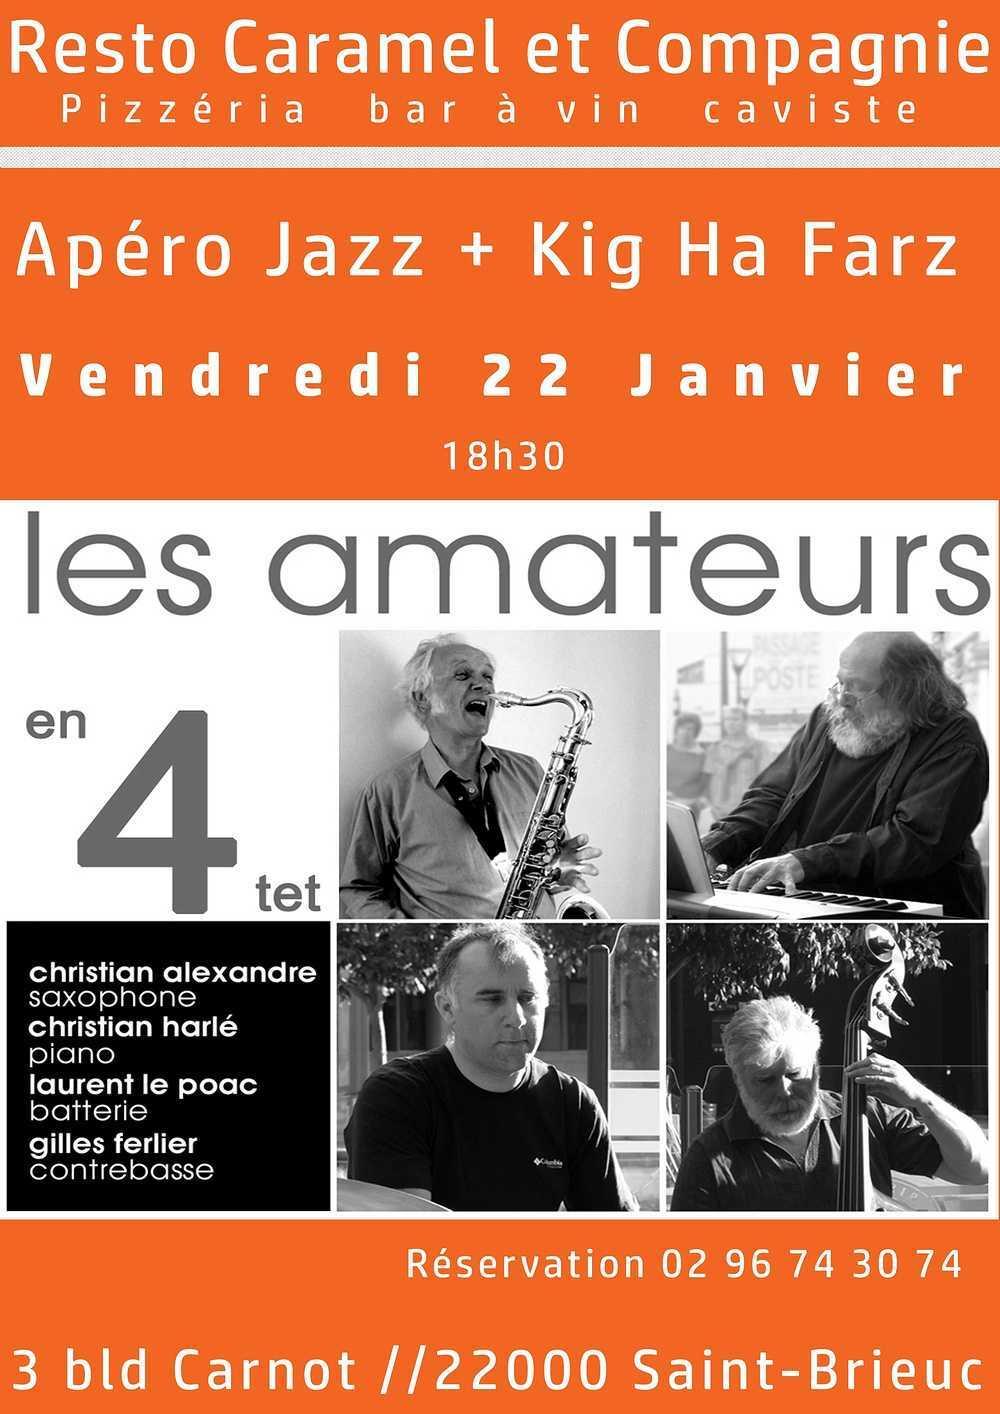 Apéro jazz et Kig Ha Farz le 22 janvier aperojazz